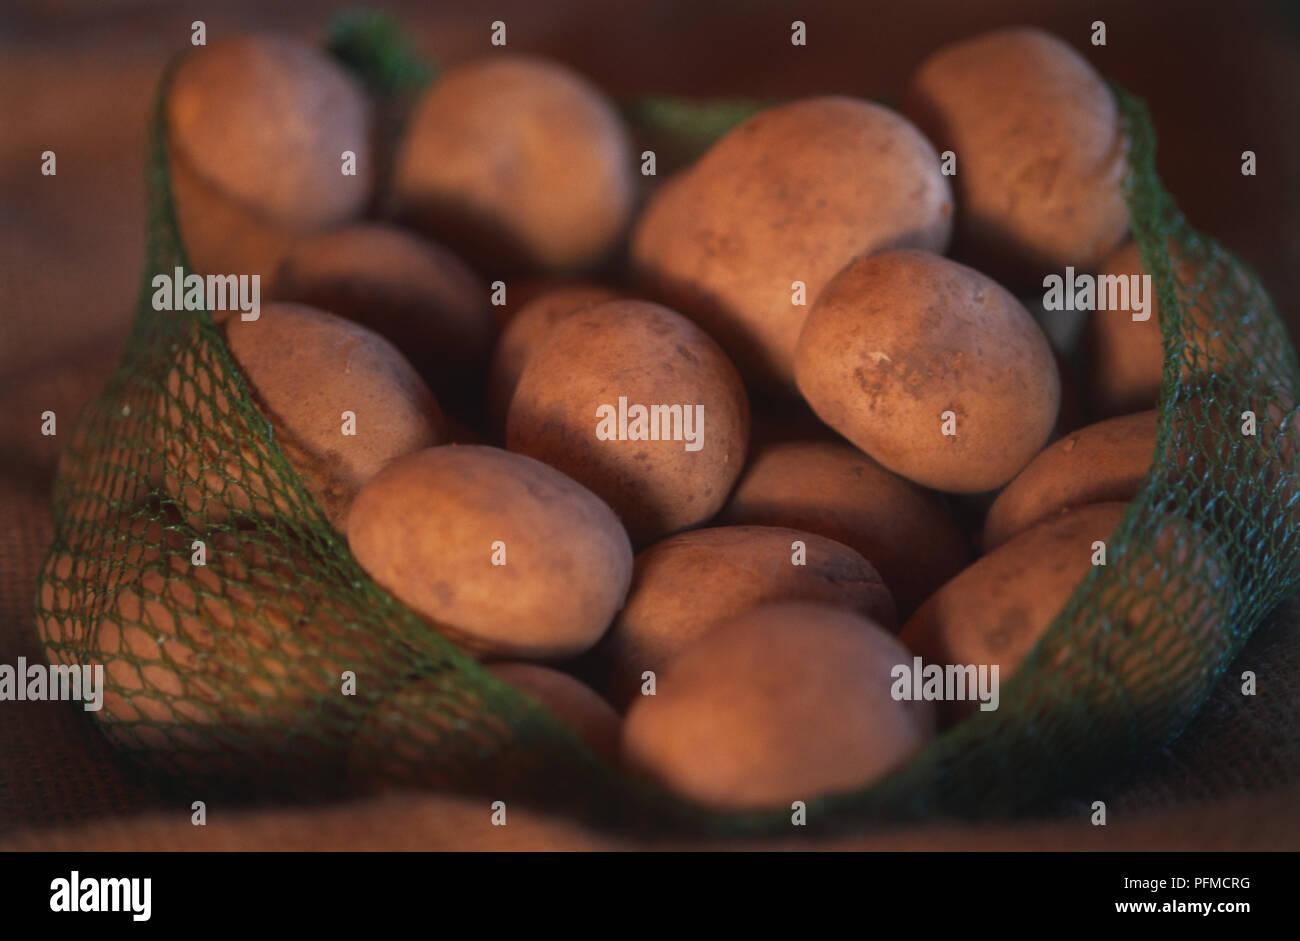 Bag of Potatoes. - Stock Image